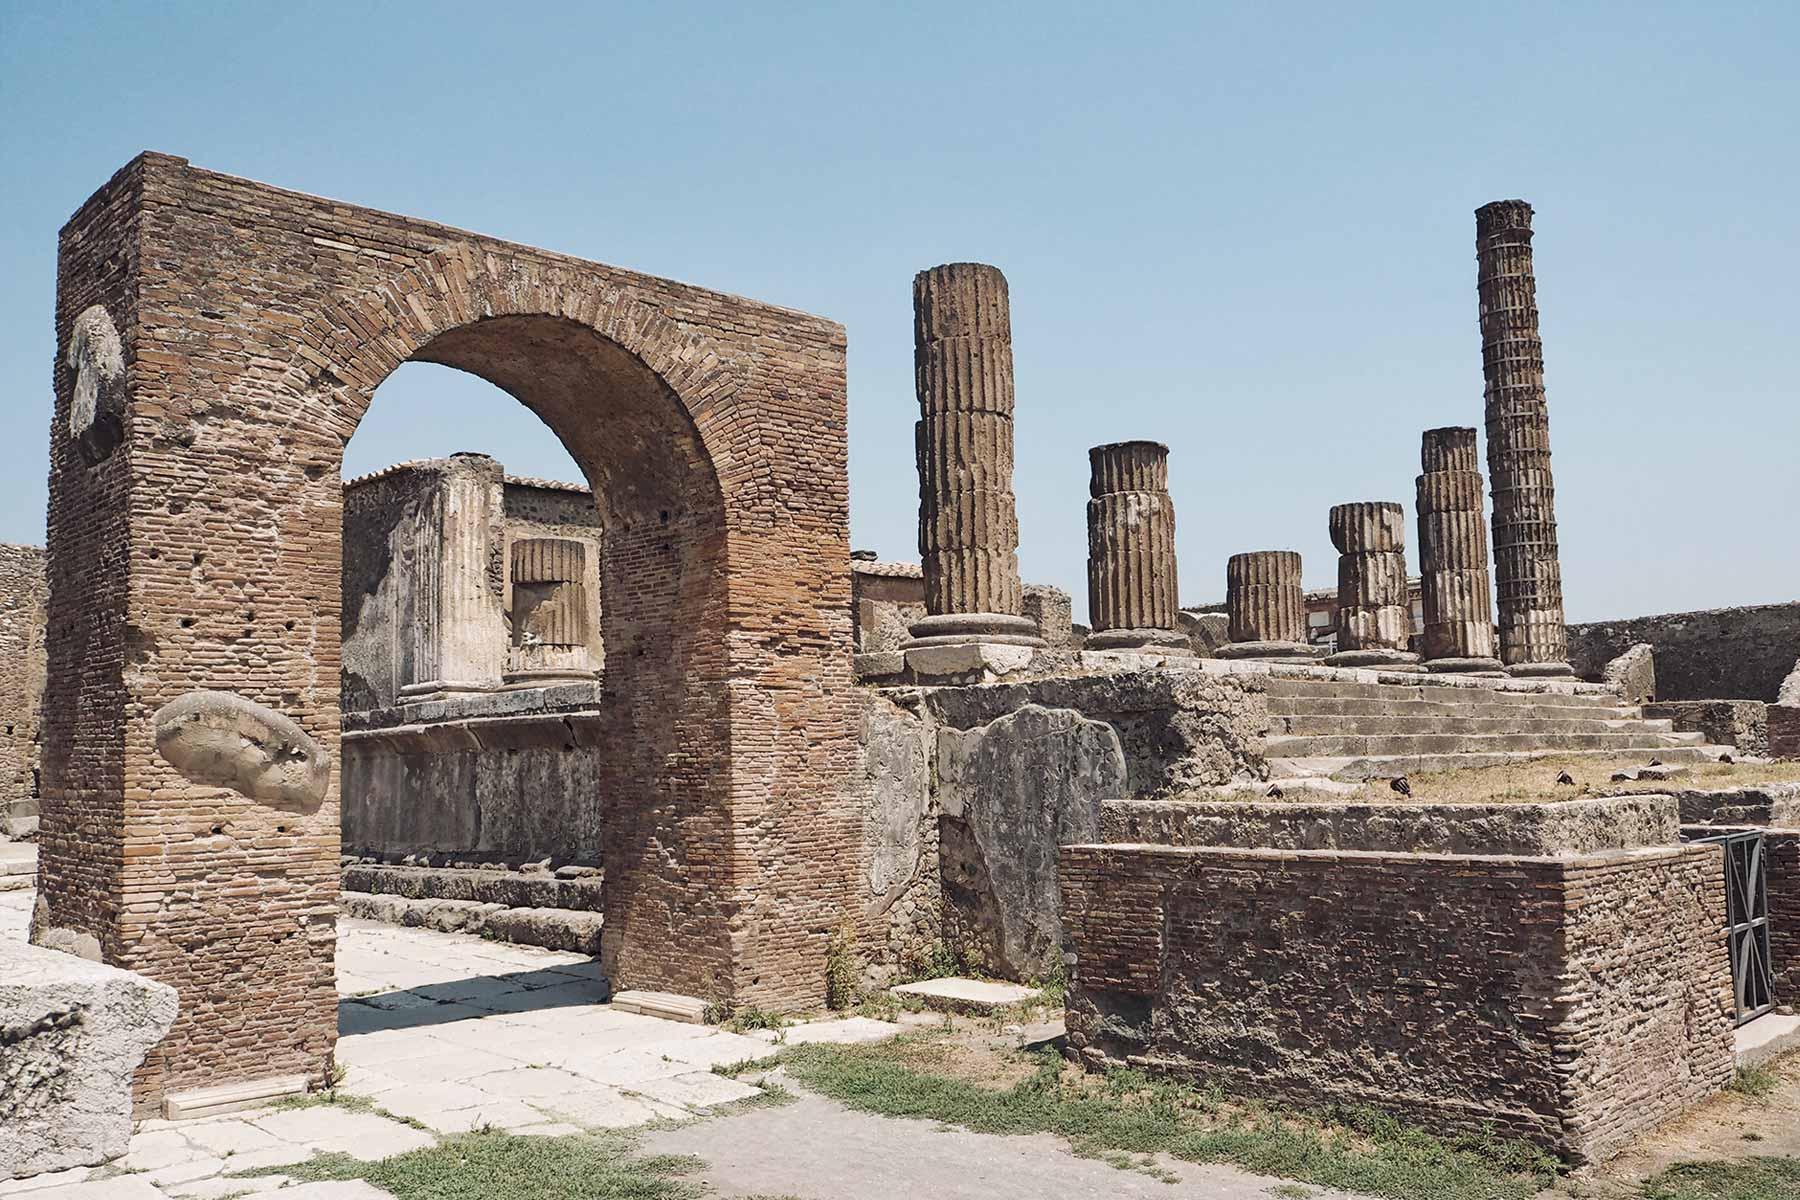 Die römische Stadt Pompeji